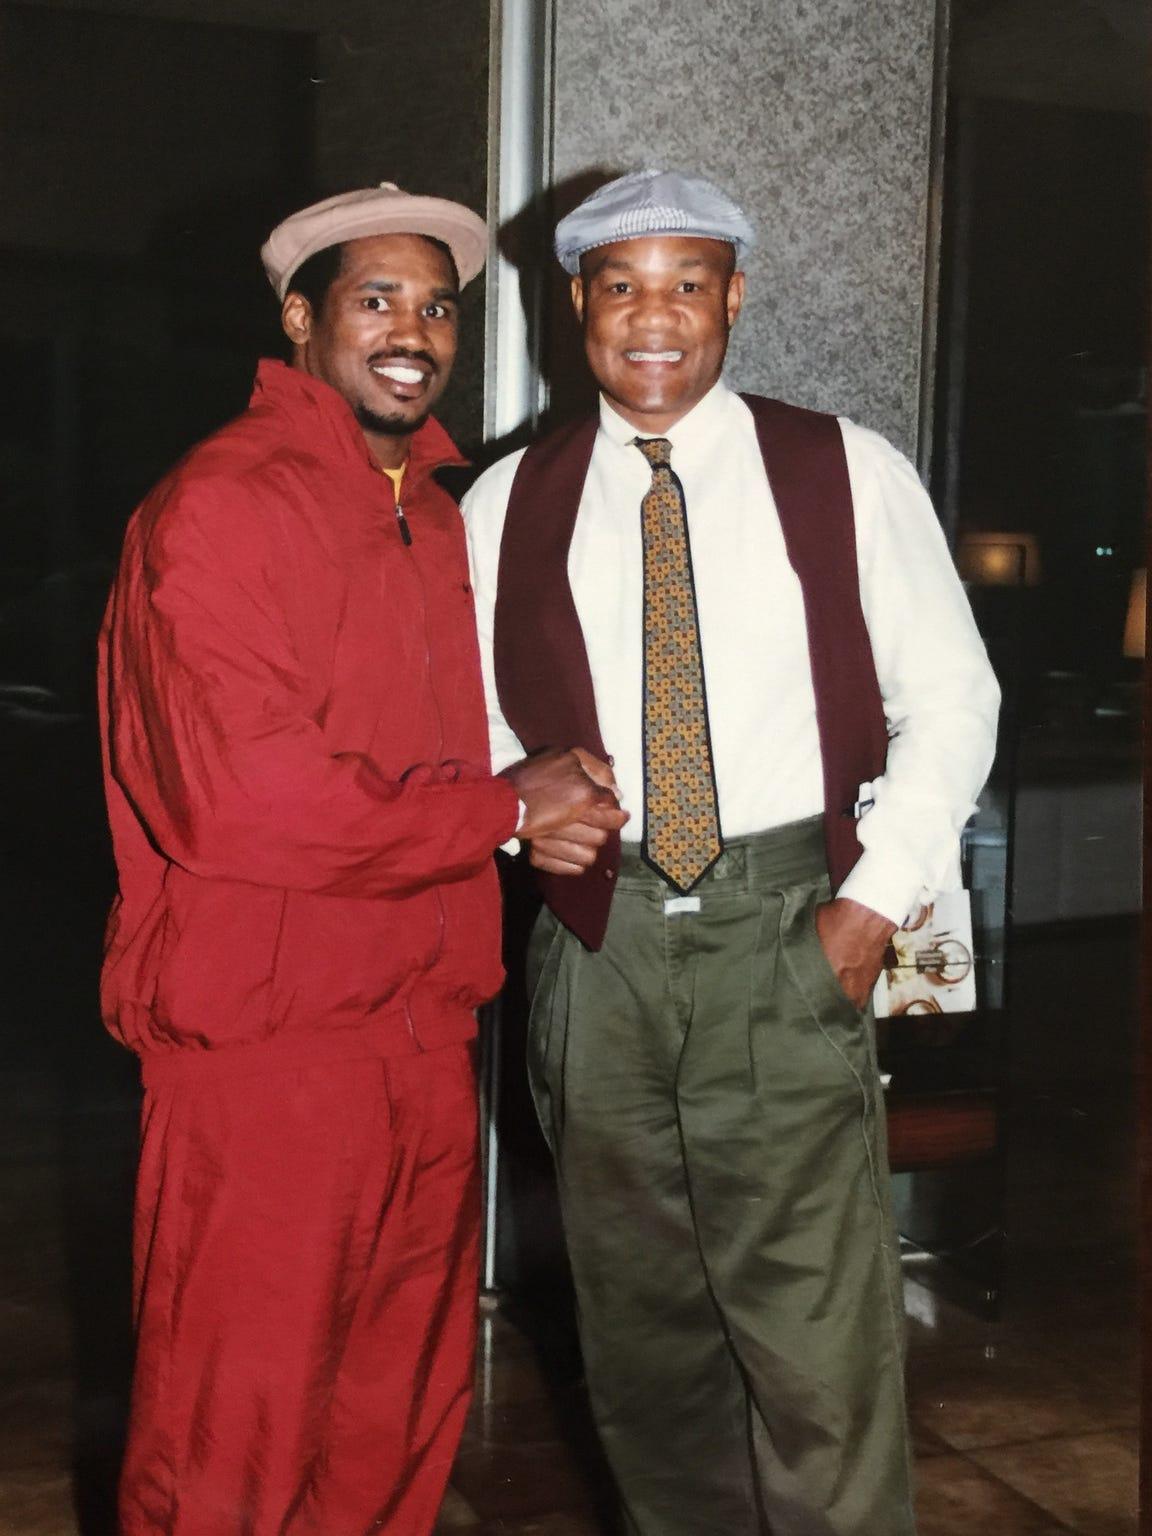 Alonzo Highsmith and former world heavyweight champion George Foreman.